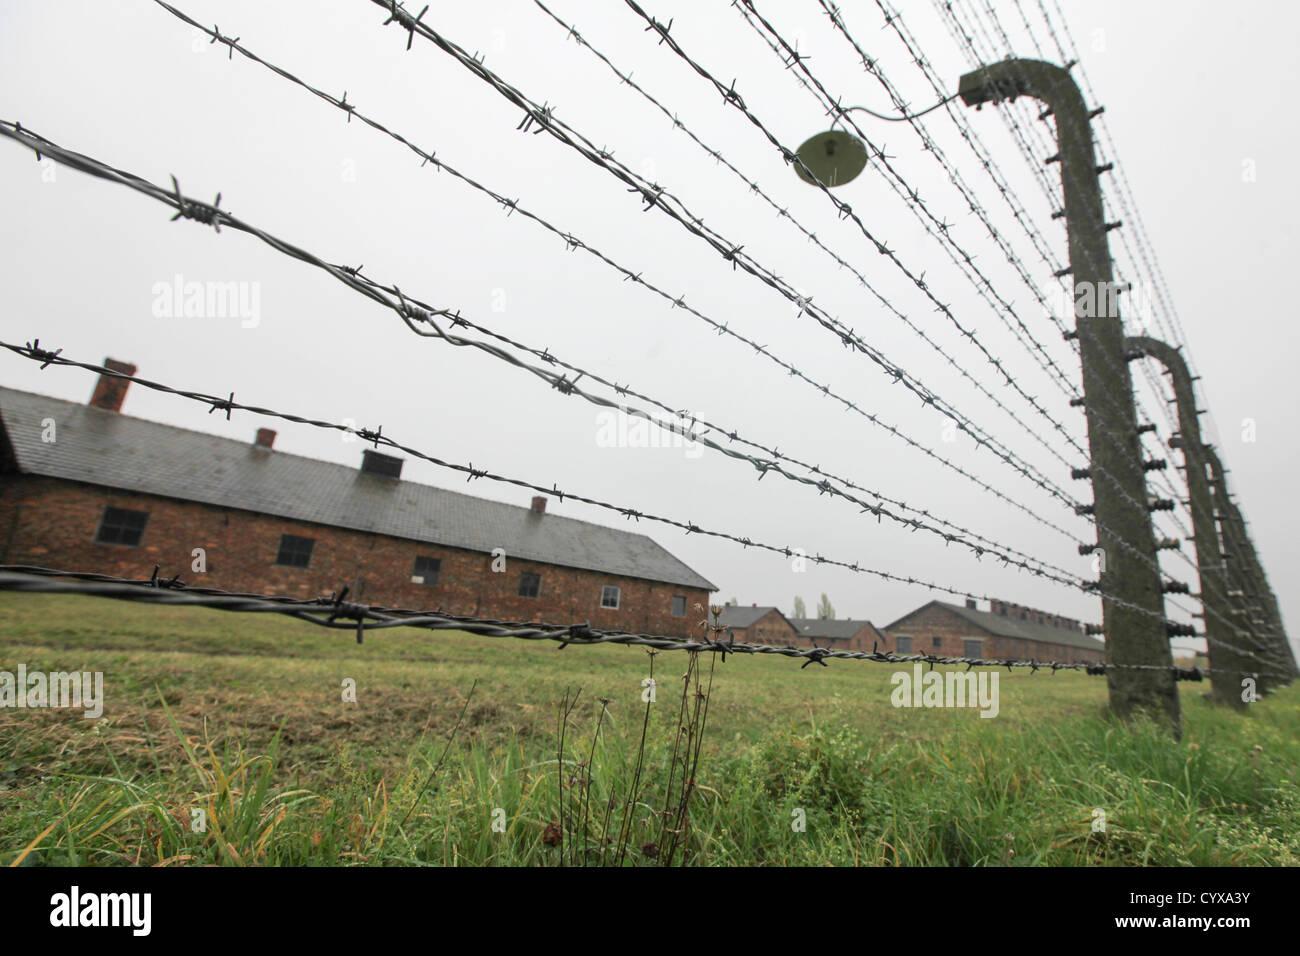 Nazi Auschwitz Extermination Camp, Poland. Barbed Wirs fences - Stock Image